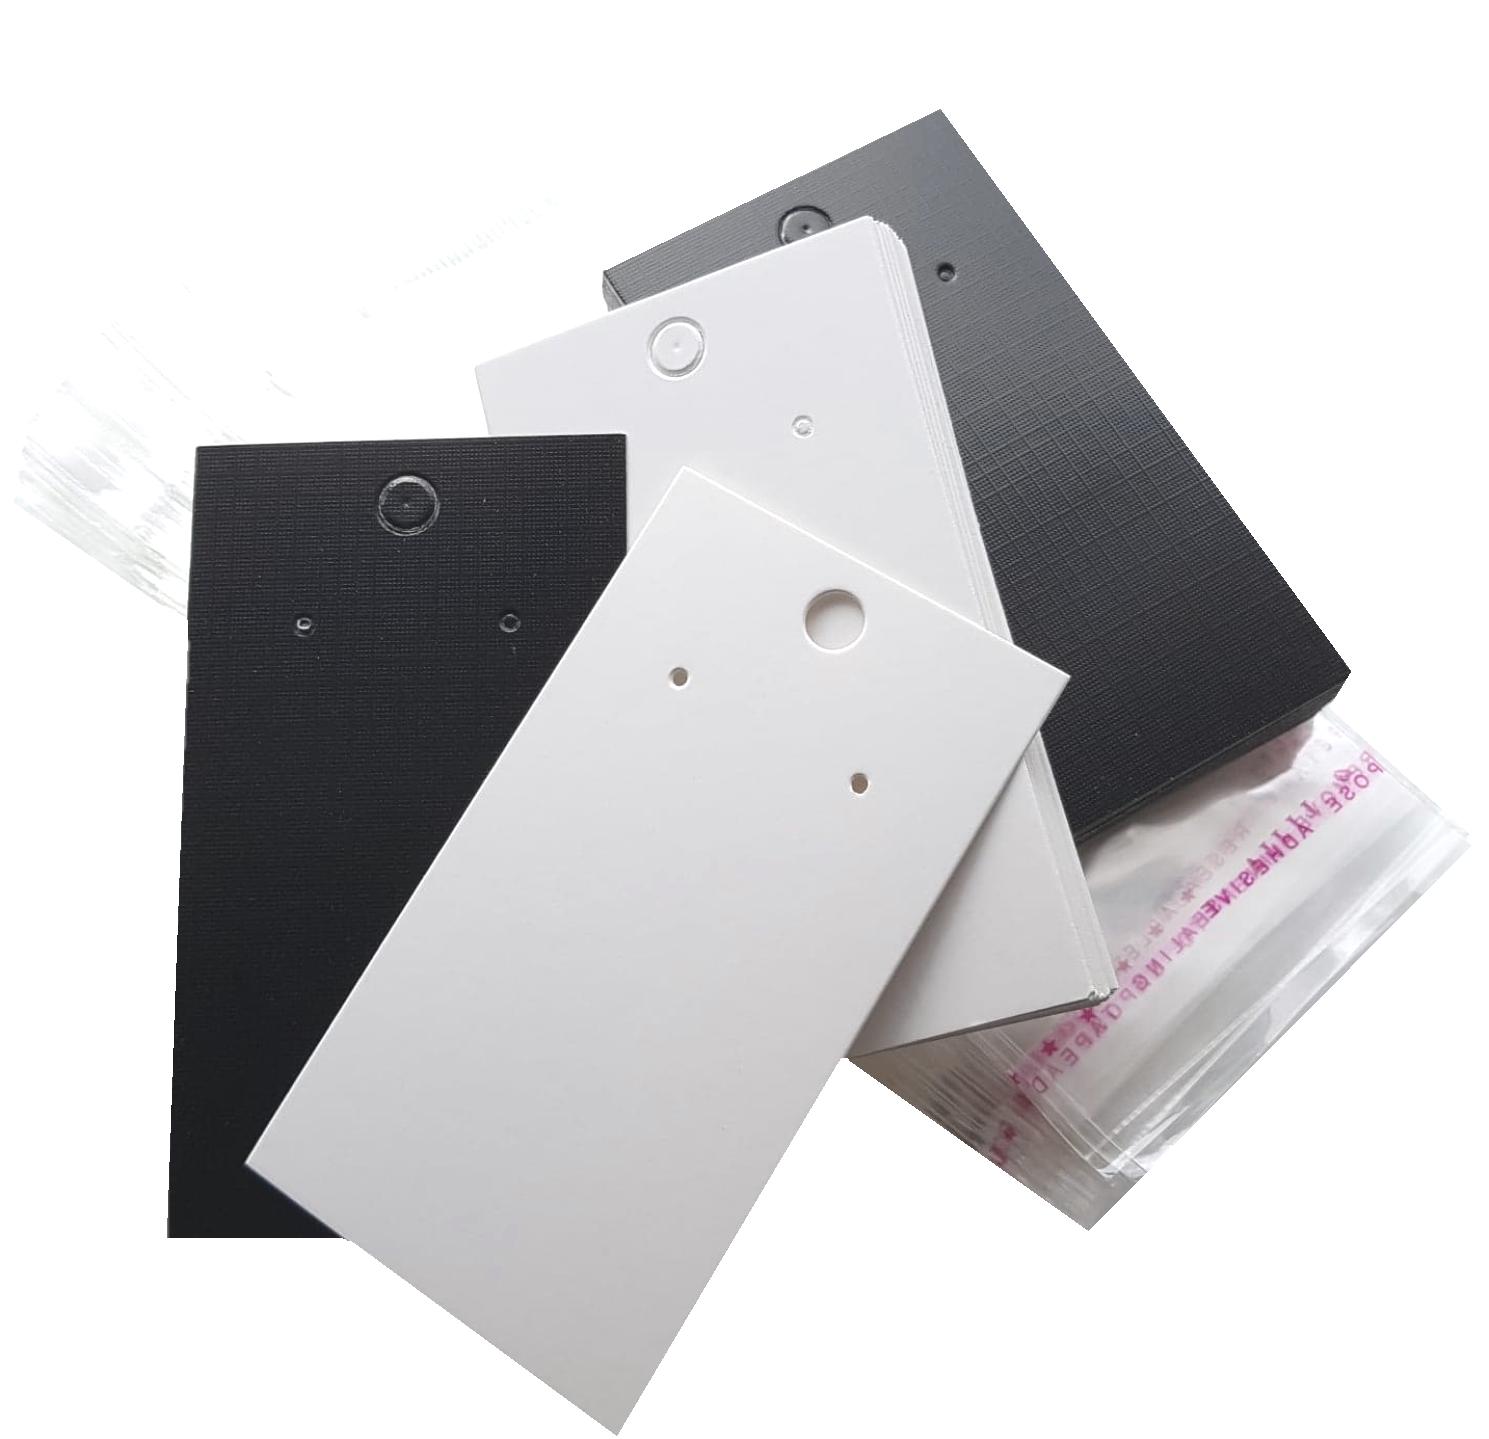 Jewellery - Jewellery Display Cards Earring Black Lattice/Plain White & Self Adhesive Bags